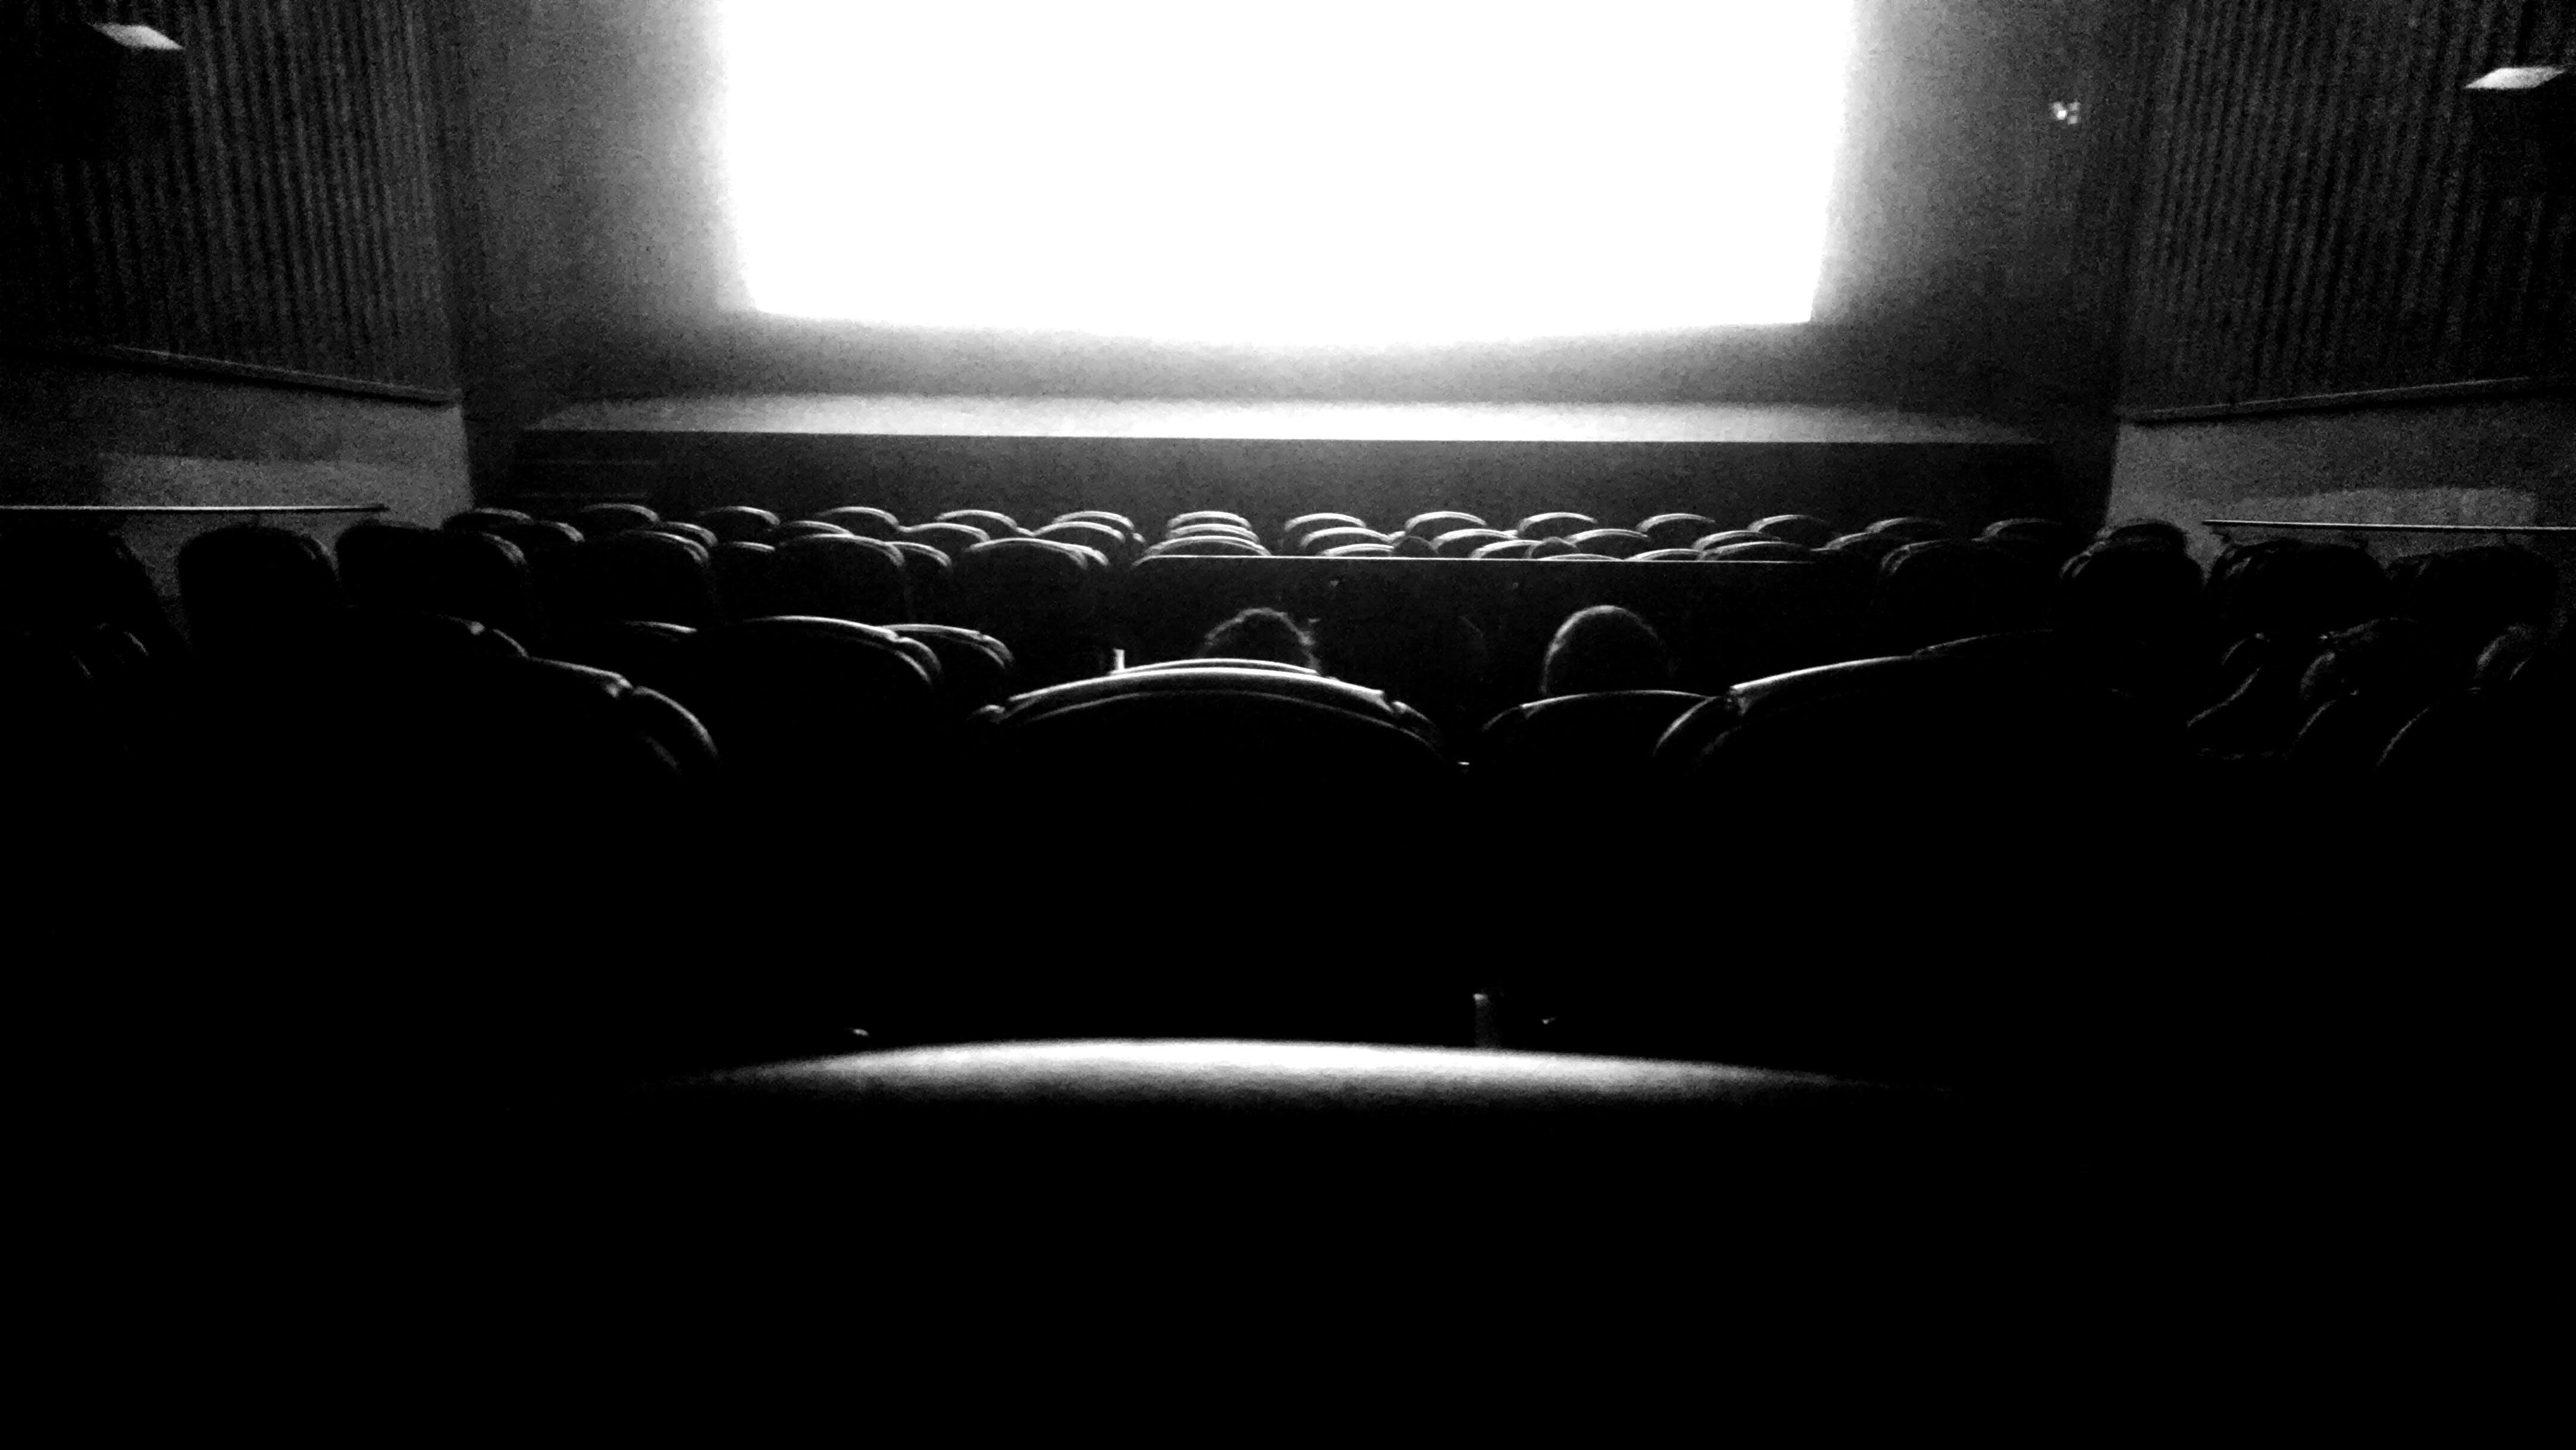 Free stock photo of screen, movie, theater, theatre